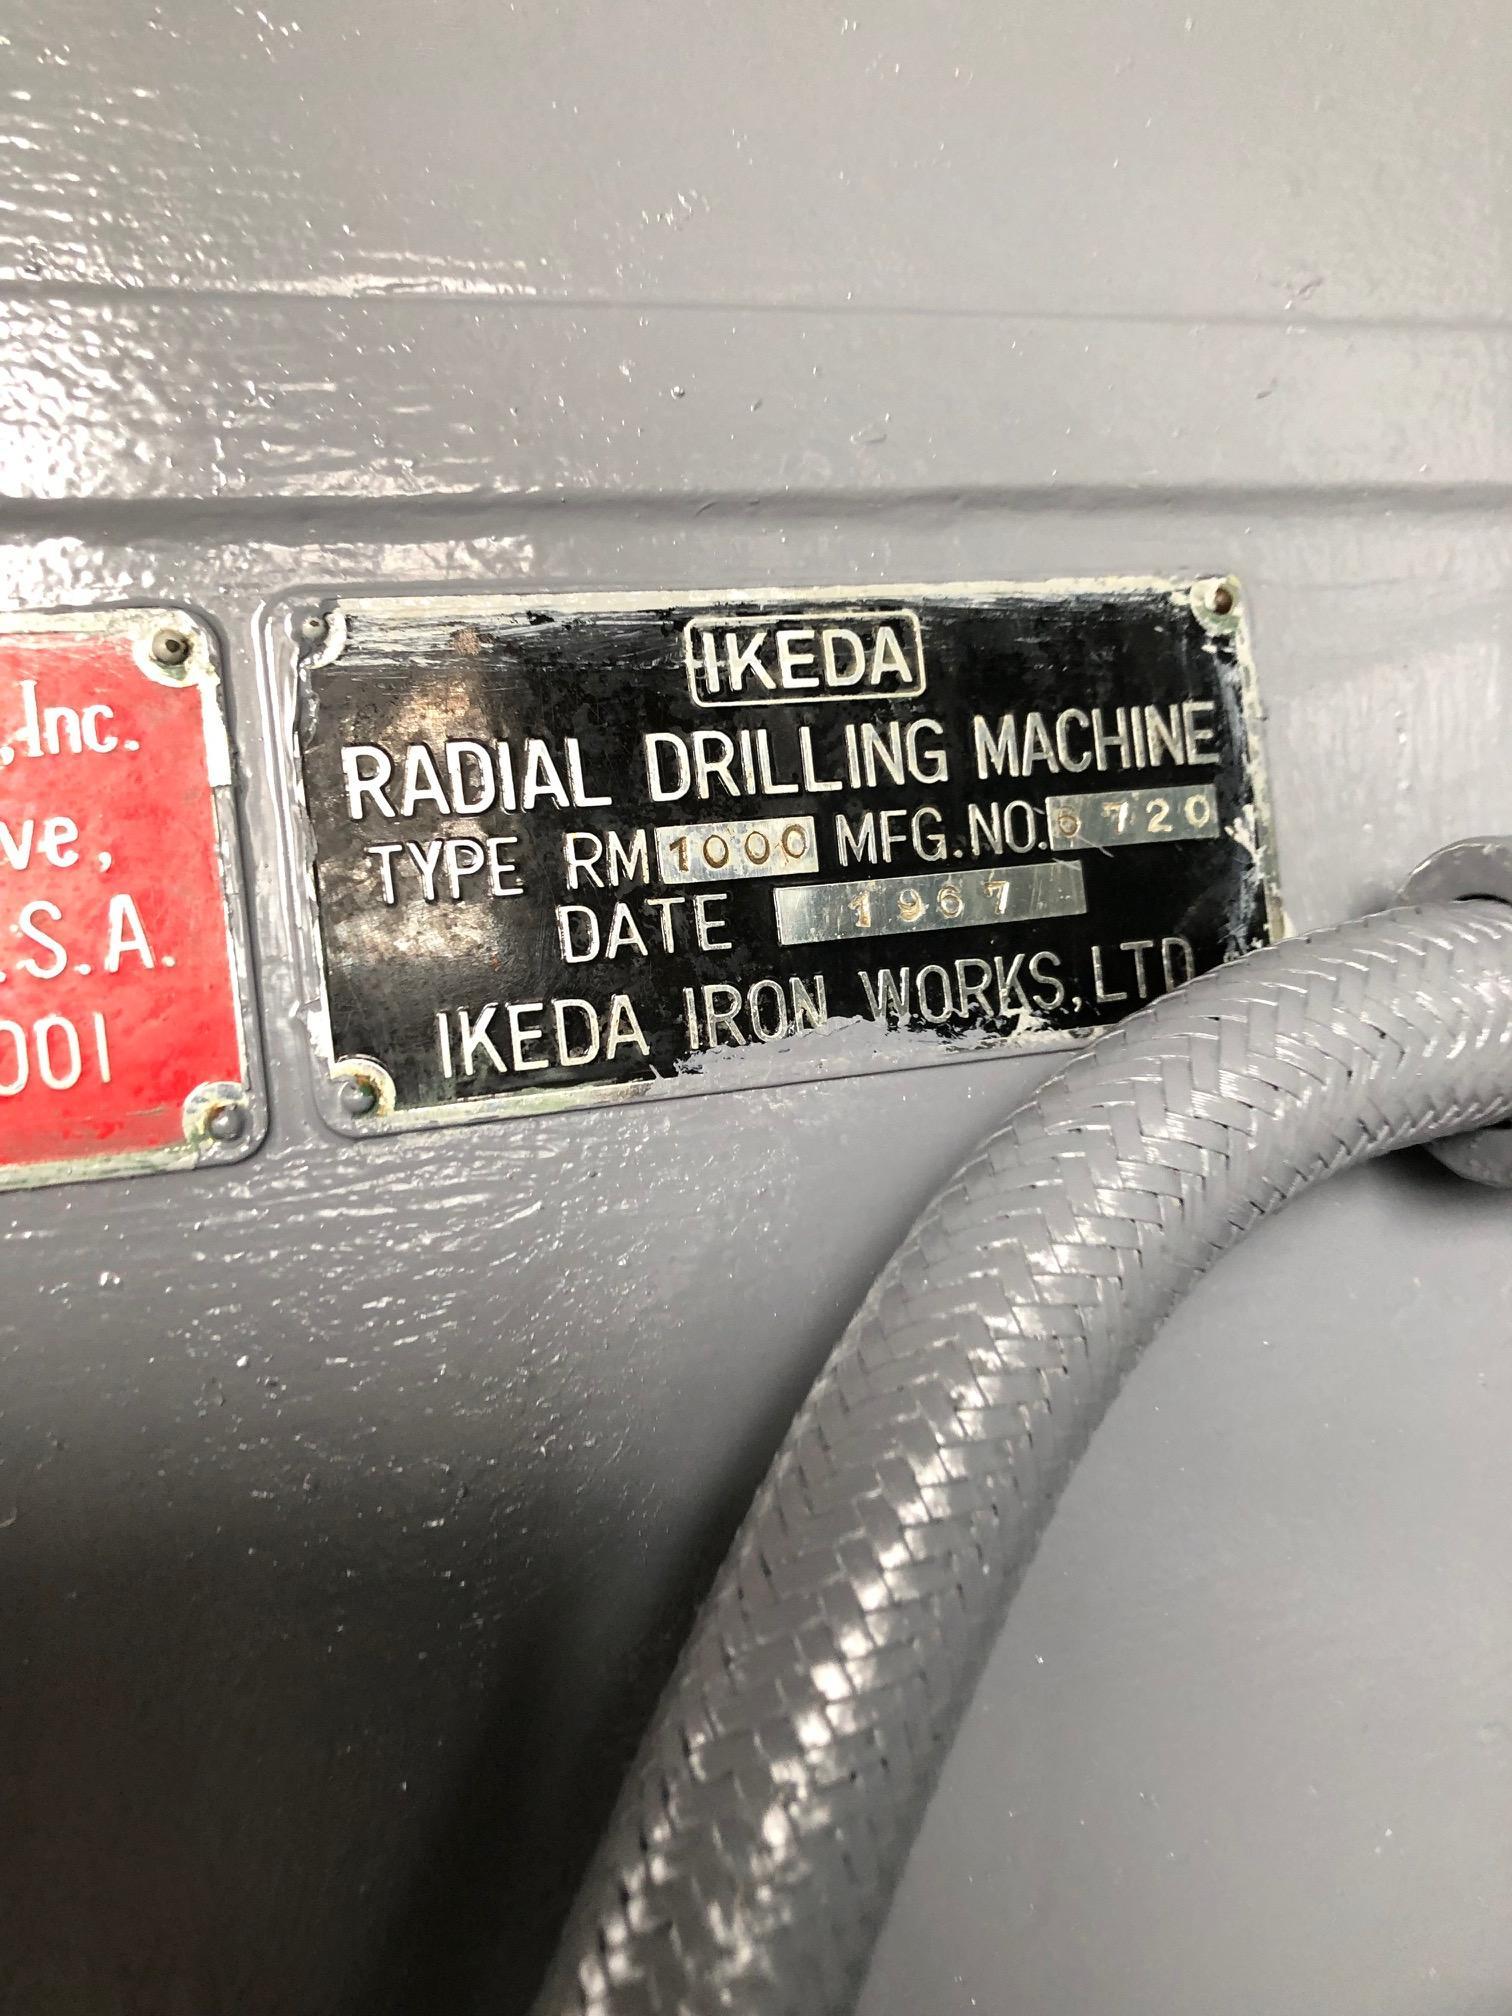 "3'6"" x 11"" IKEDA RM1000 RADIAL ARM DRILL PRESS: STOCK #10468"